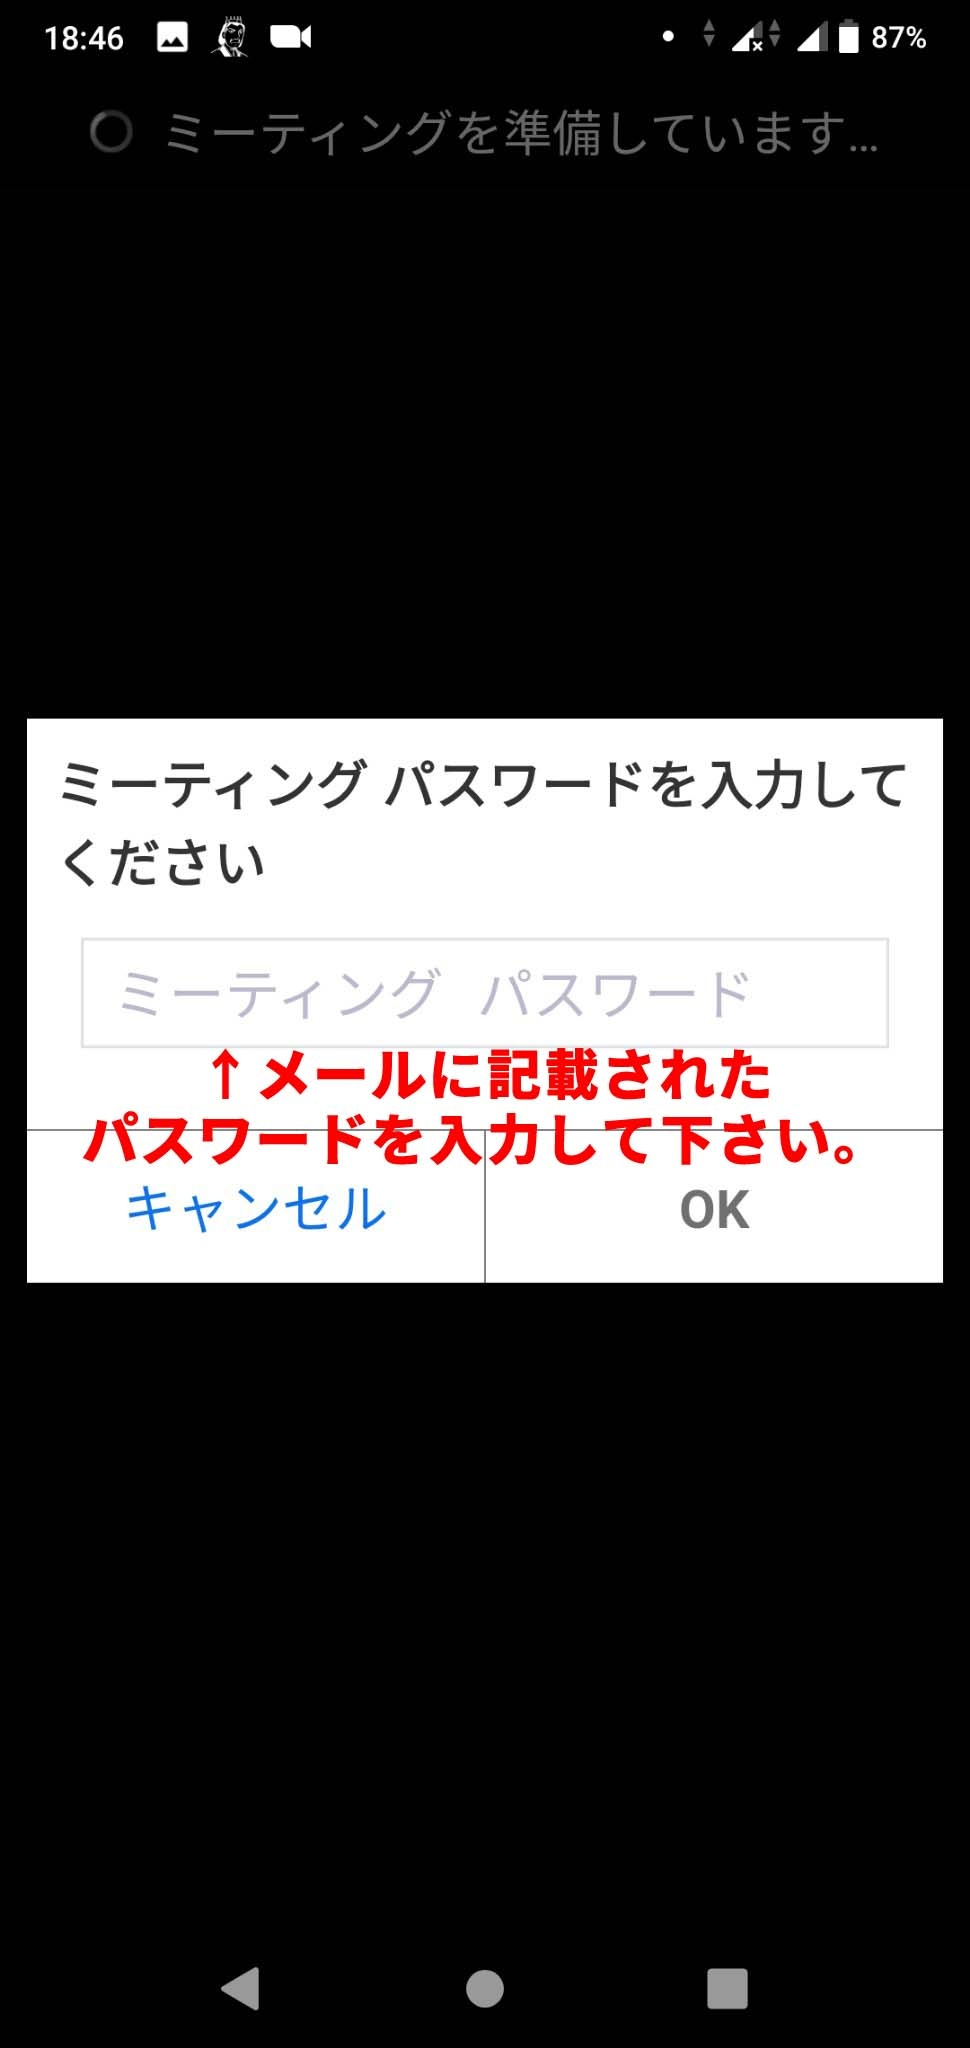 https://www.g-e.jp/9065acb55480e5f93672f477494269bc8adfb6be.jpg